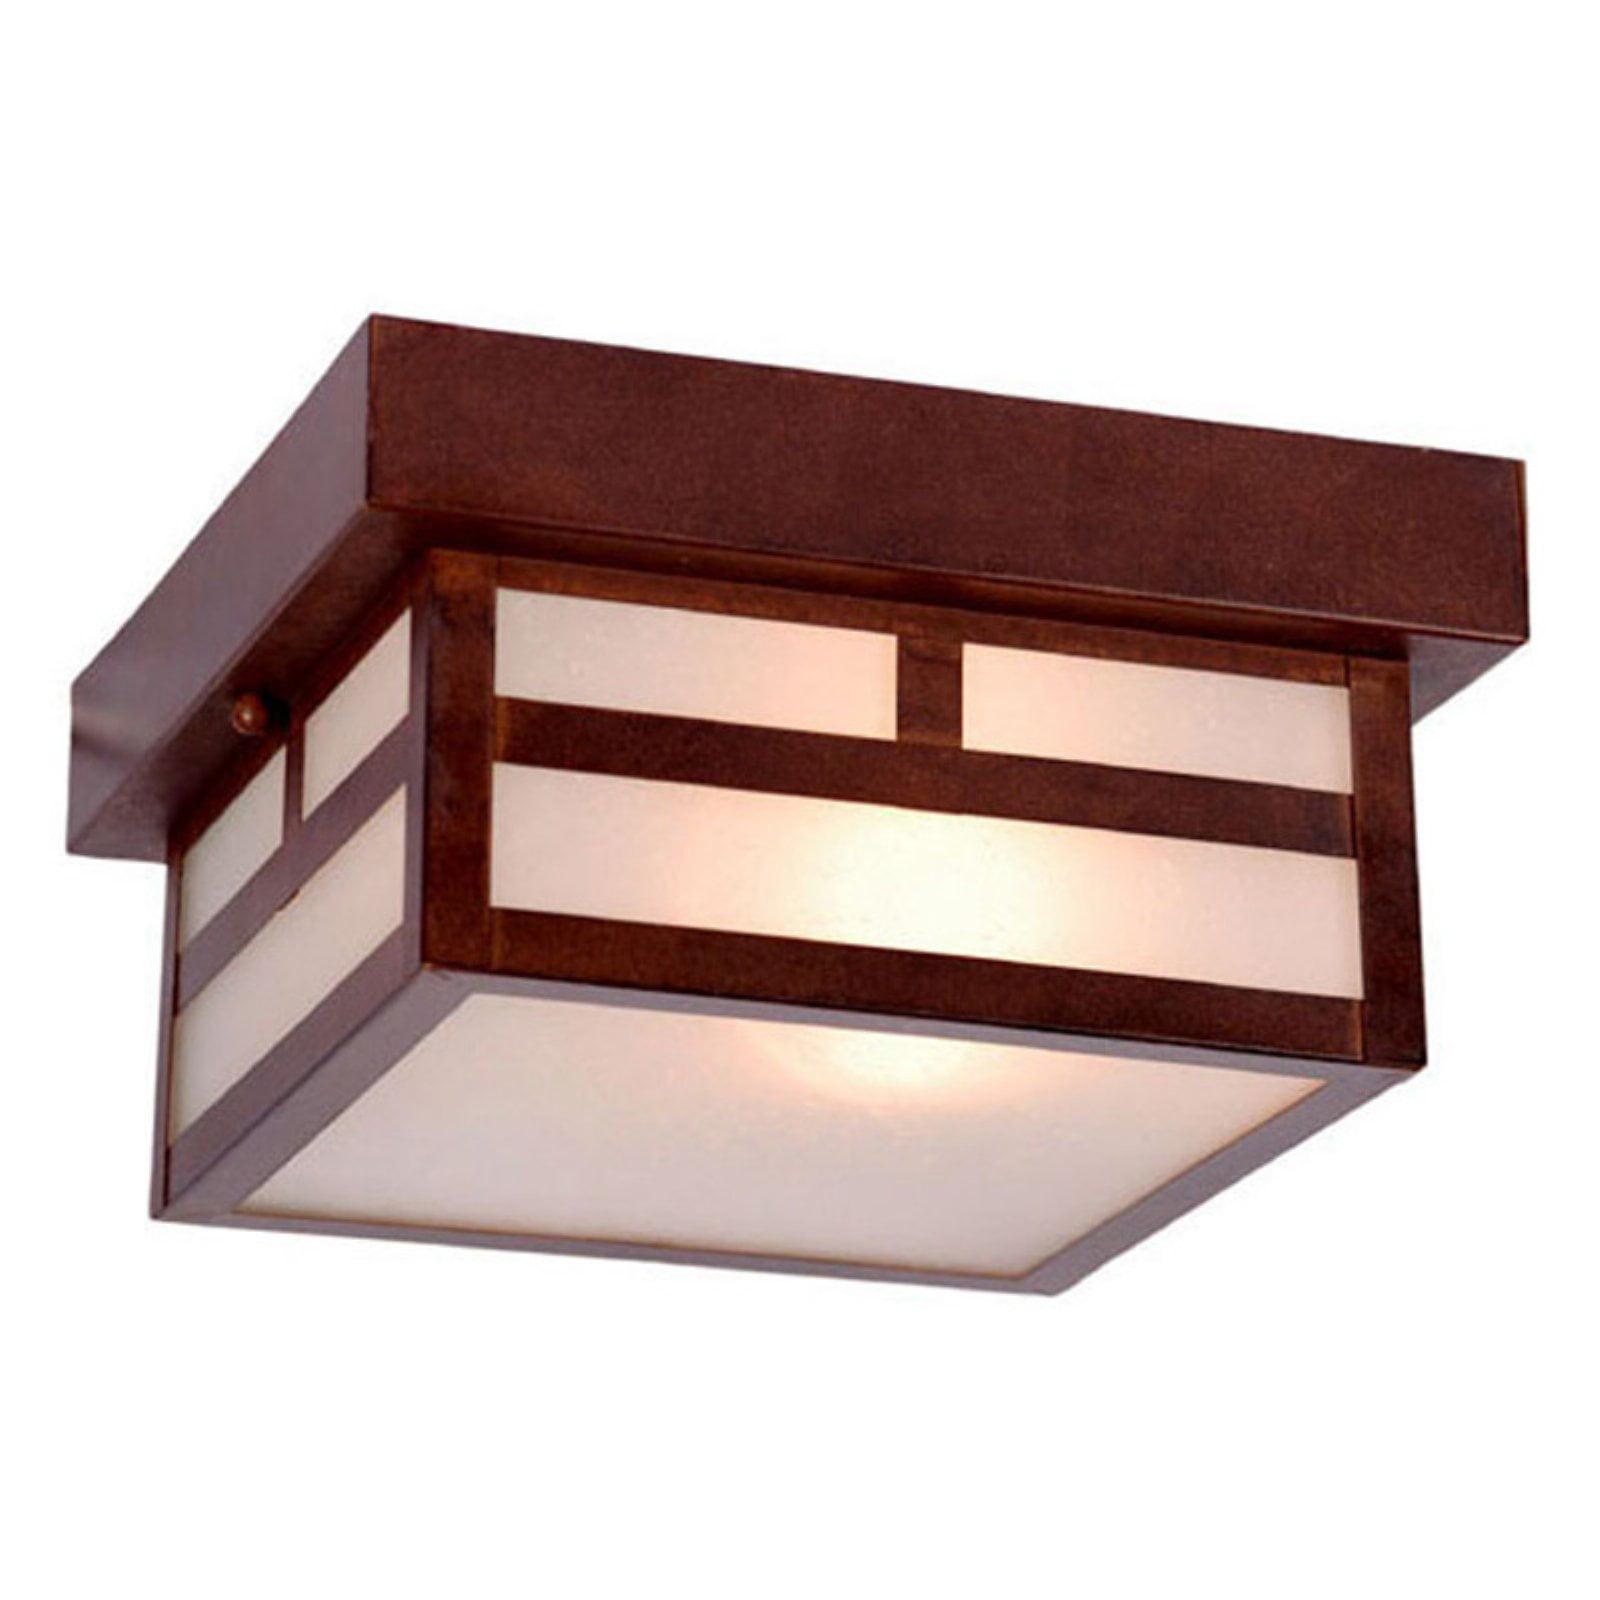 Acclaim Lighting Artisan 1 Light Outdoor Ceiling Mount Light Fixture by Acclaim Lighting